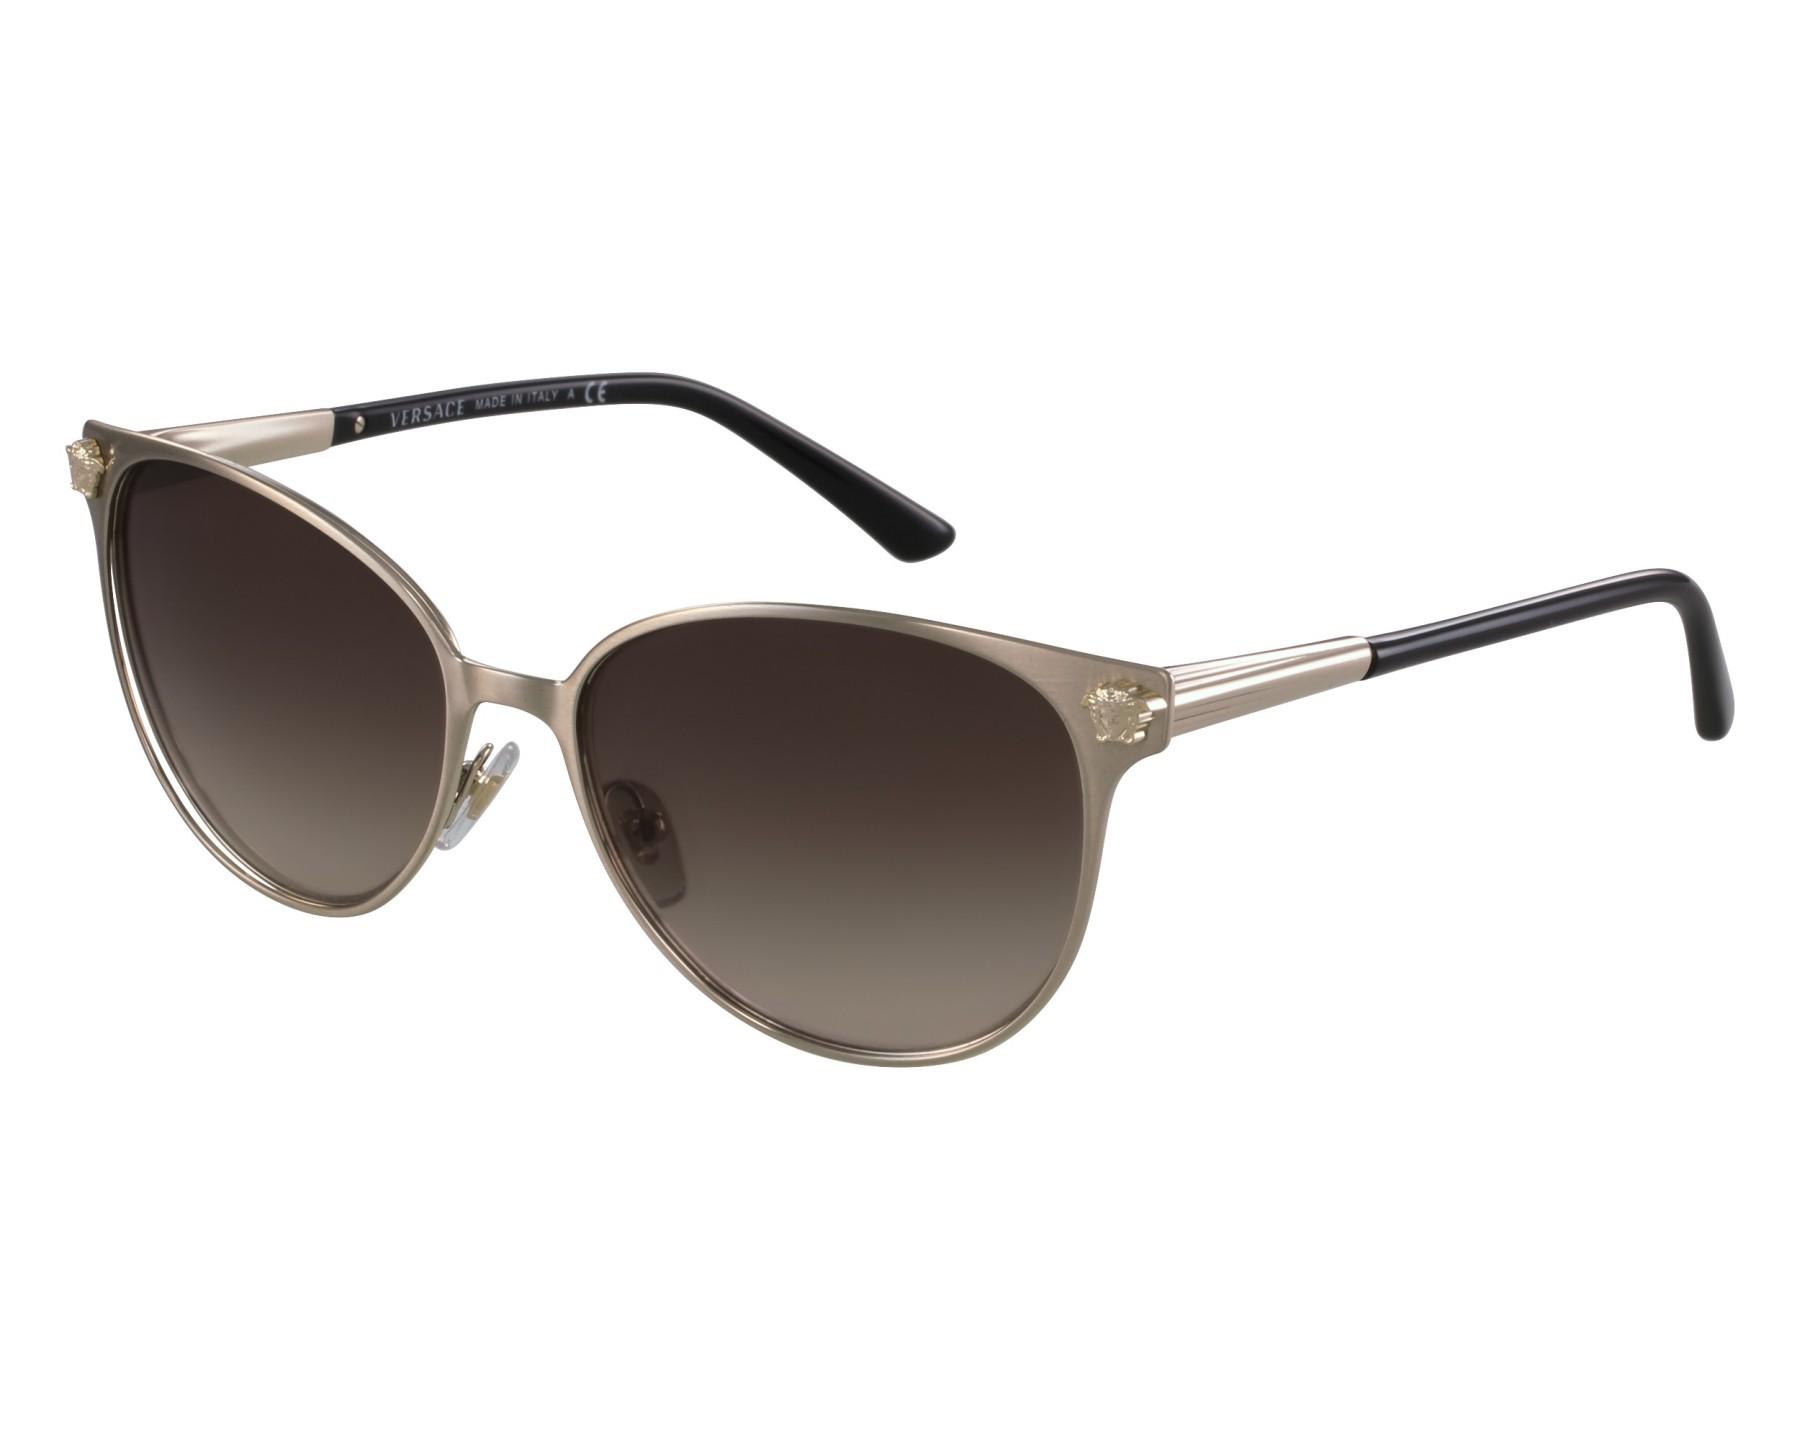 6638ebc1bb Gafas de sol Versace VE-2168 1339 13 57-16 Oro Negra vista